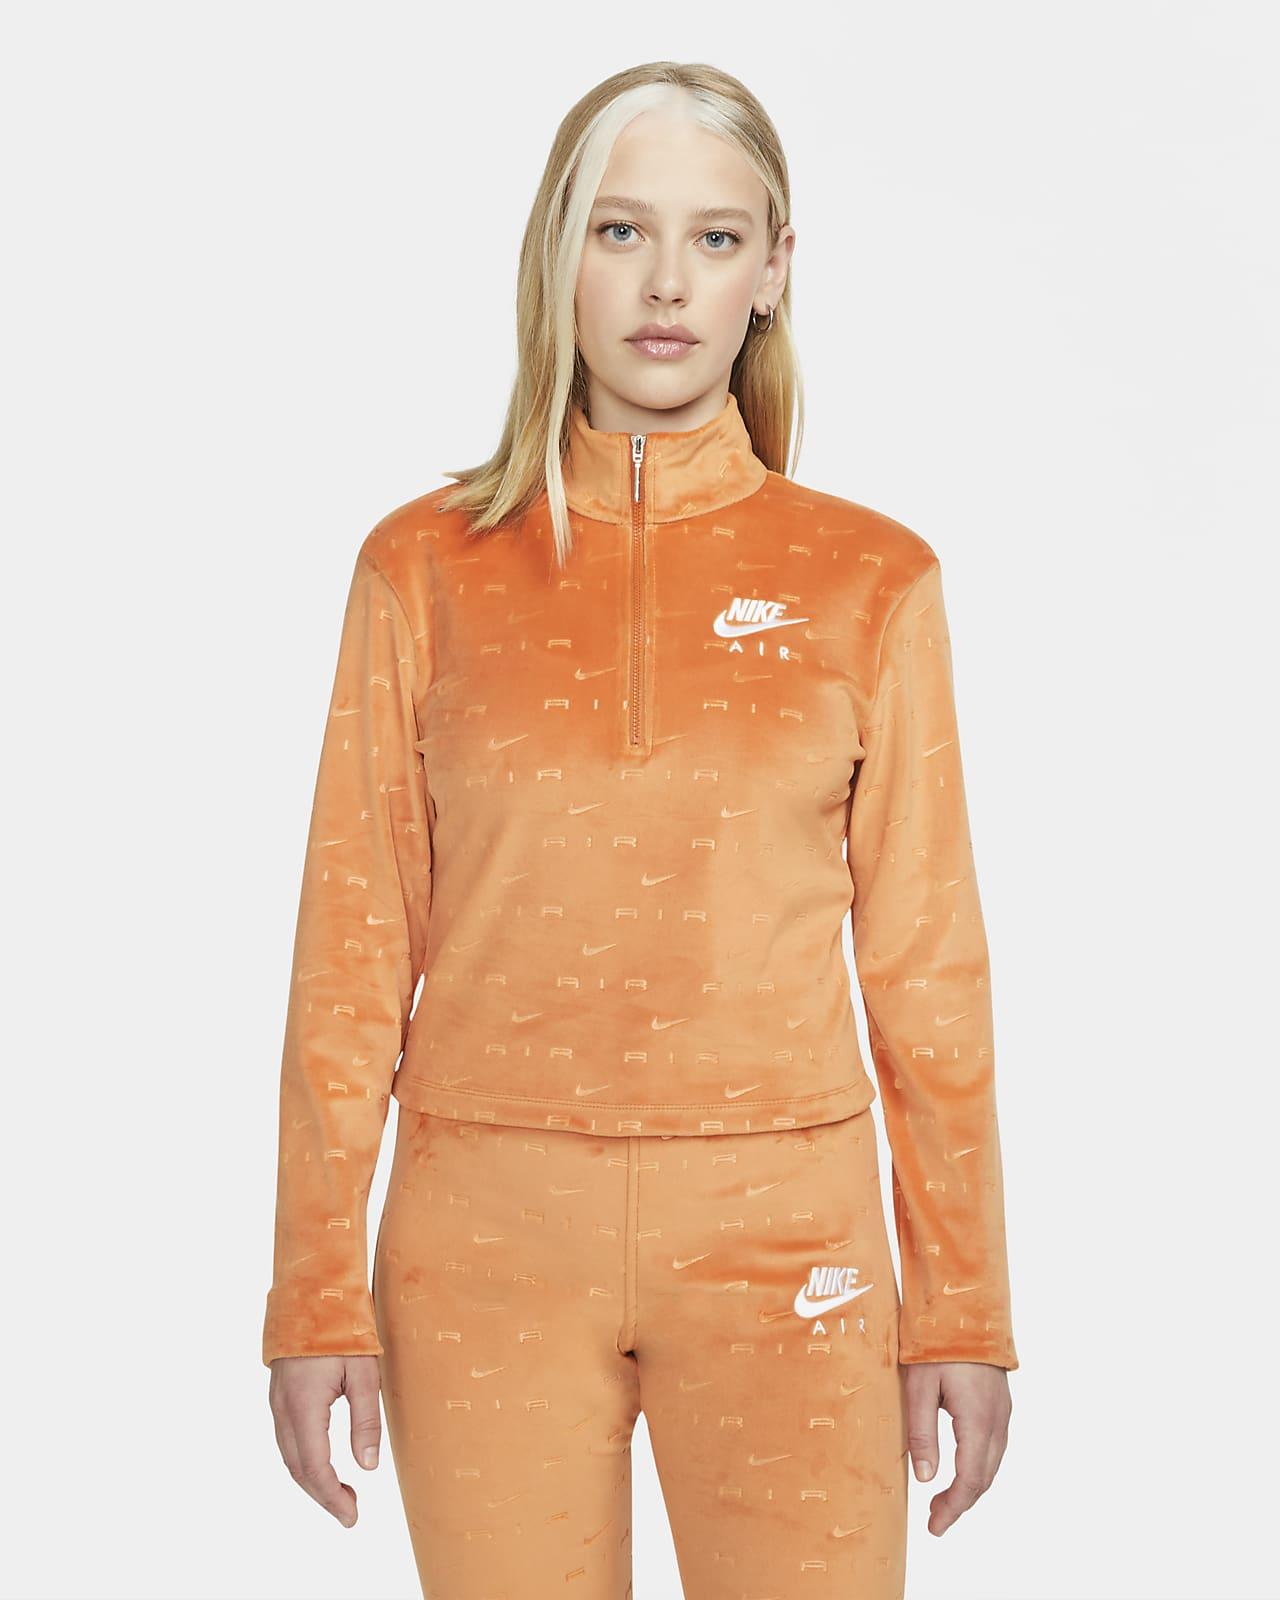 Nike Air Women's Velour 1/4-Zip Long-Sleeve Top